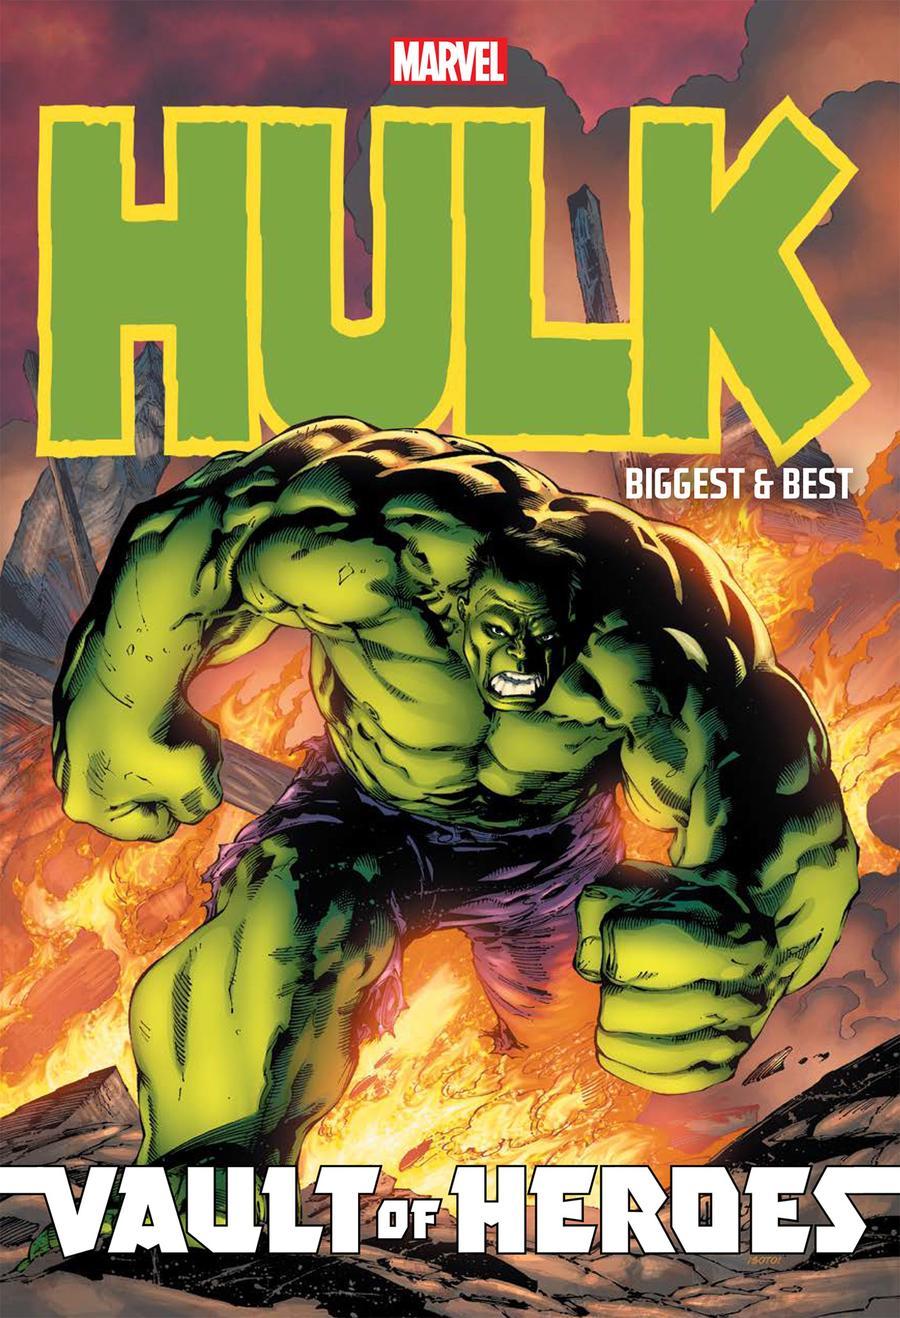 Marvel Vault Of Heroes Hulk Biggest & Best TP